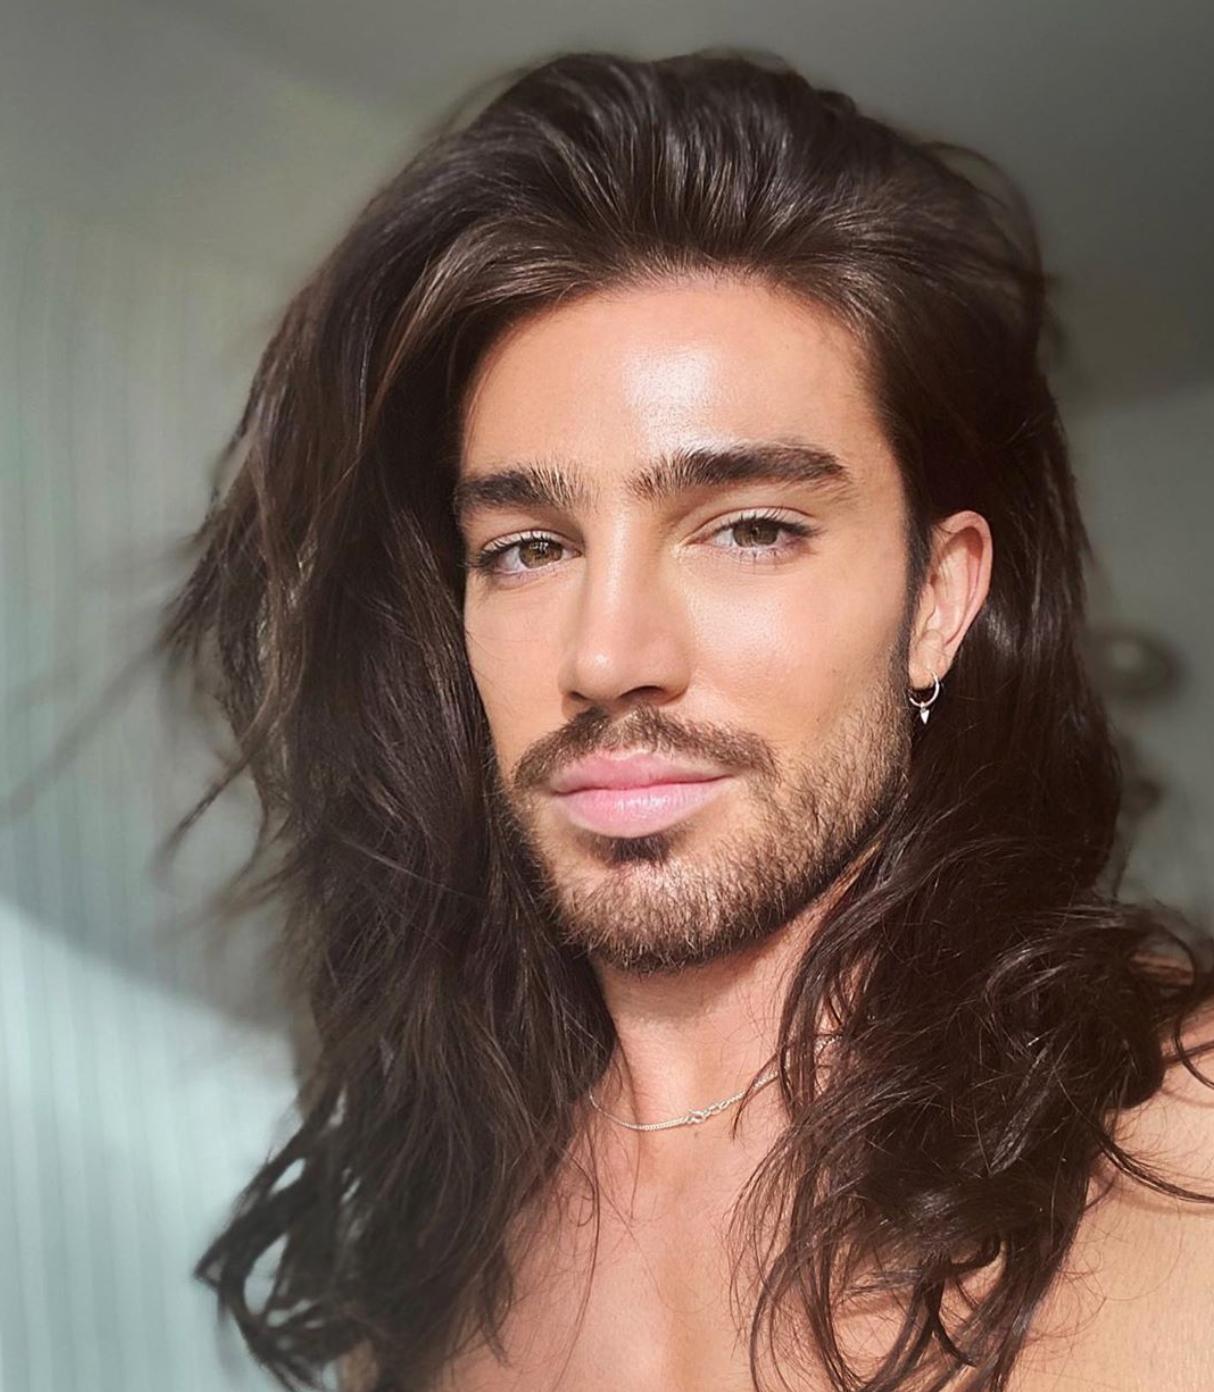 Jay Birmingham Hair Hair Growth For Men Long Hair Styles Men Hair Growth Problems